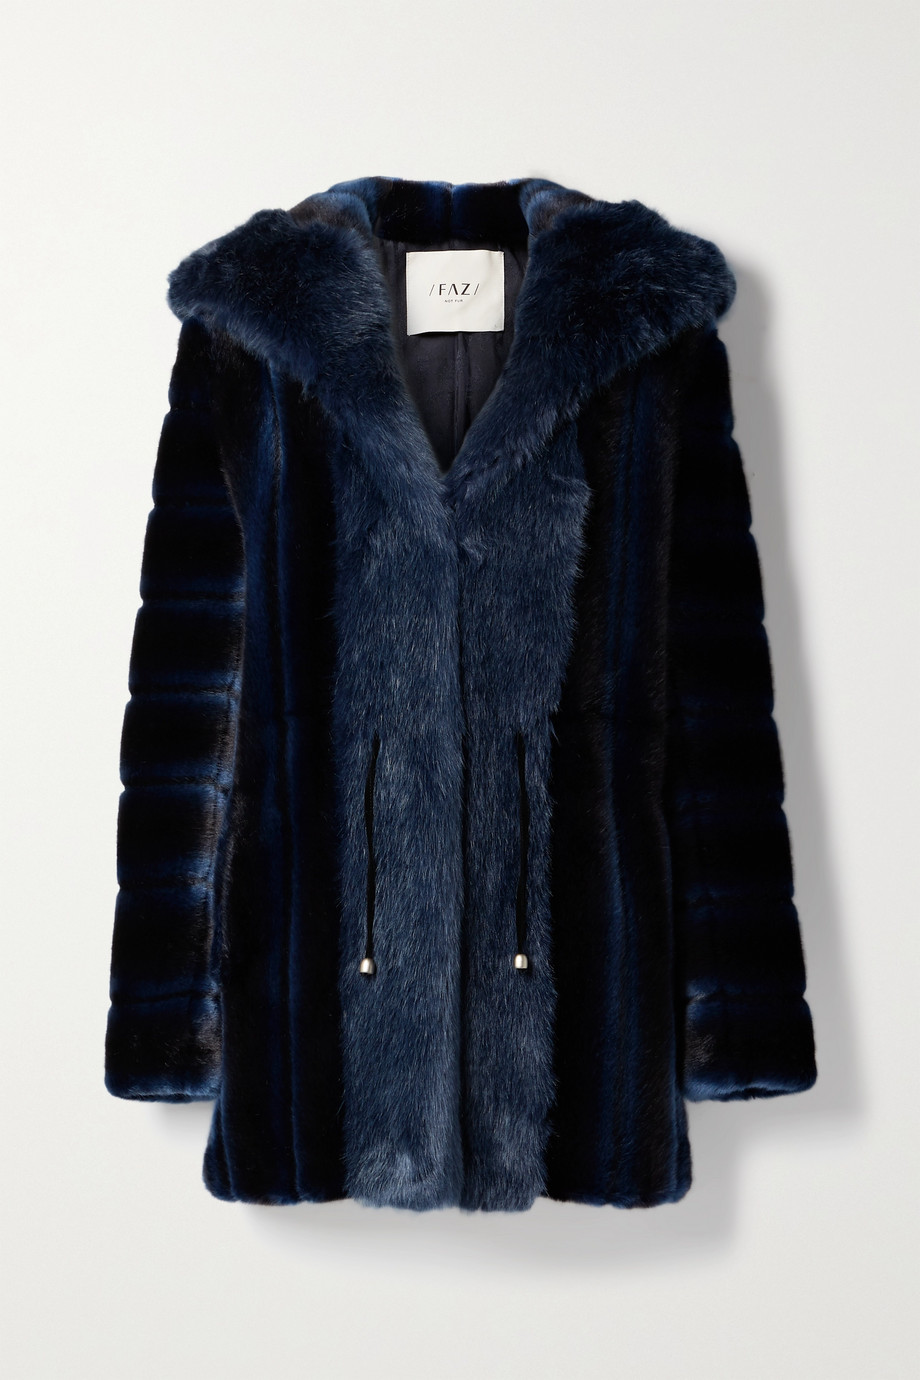 Faz Not Fur Skate Moss zweifarbiger Mantel aus Faux Fur mit Kapuze